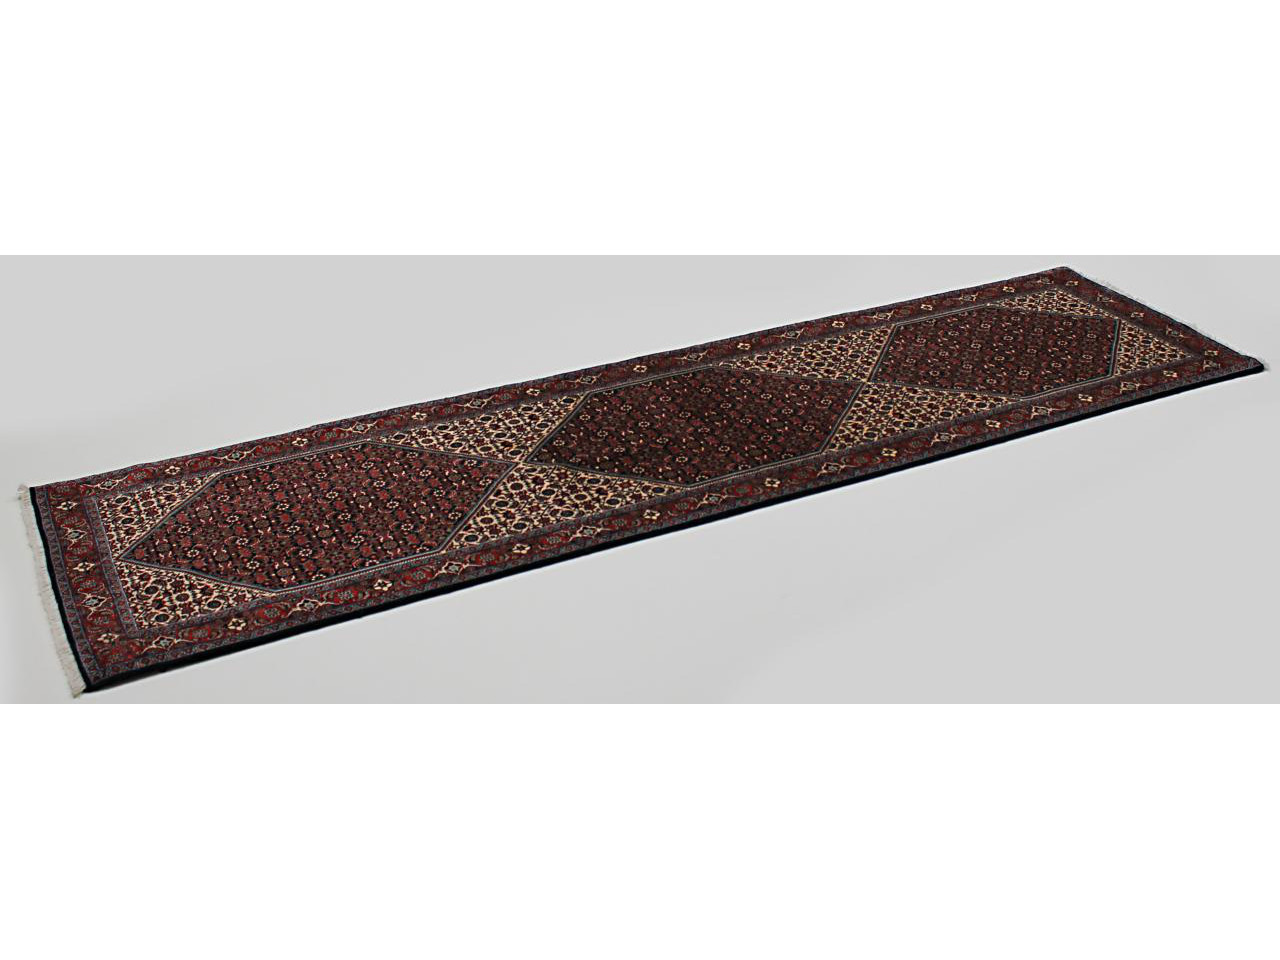 bidjar fin tapis persans n 3670 320x87cm. Black Bedroom Furniture Sets. Home Design Ideas